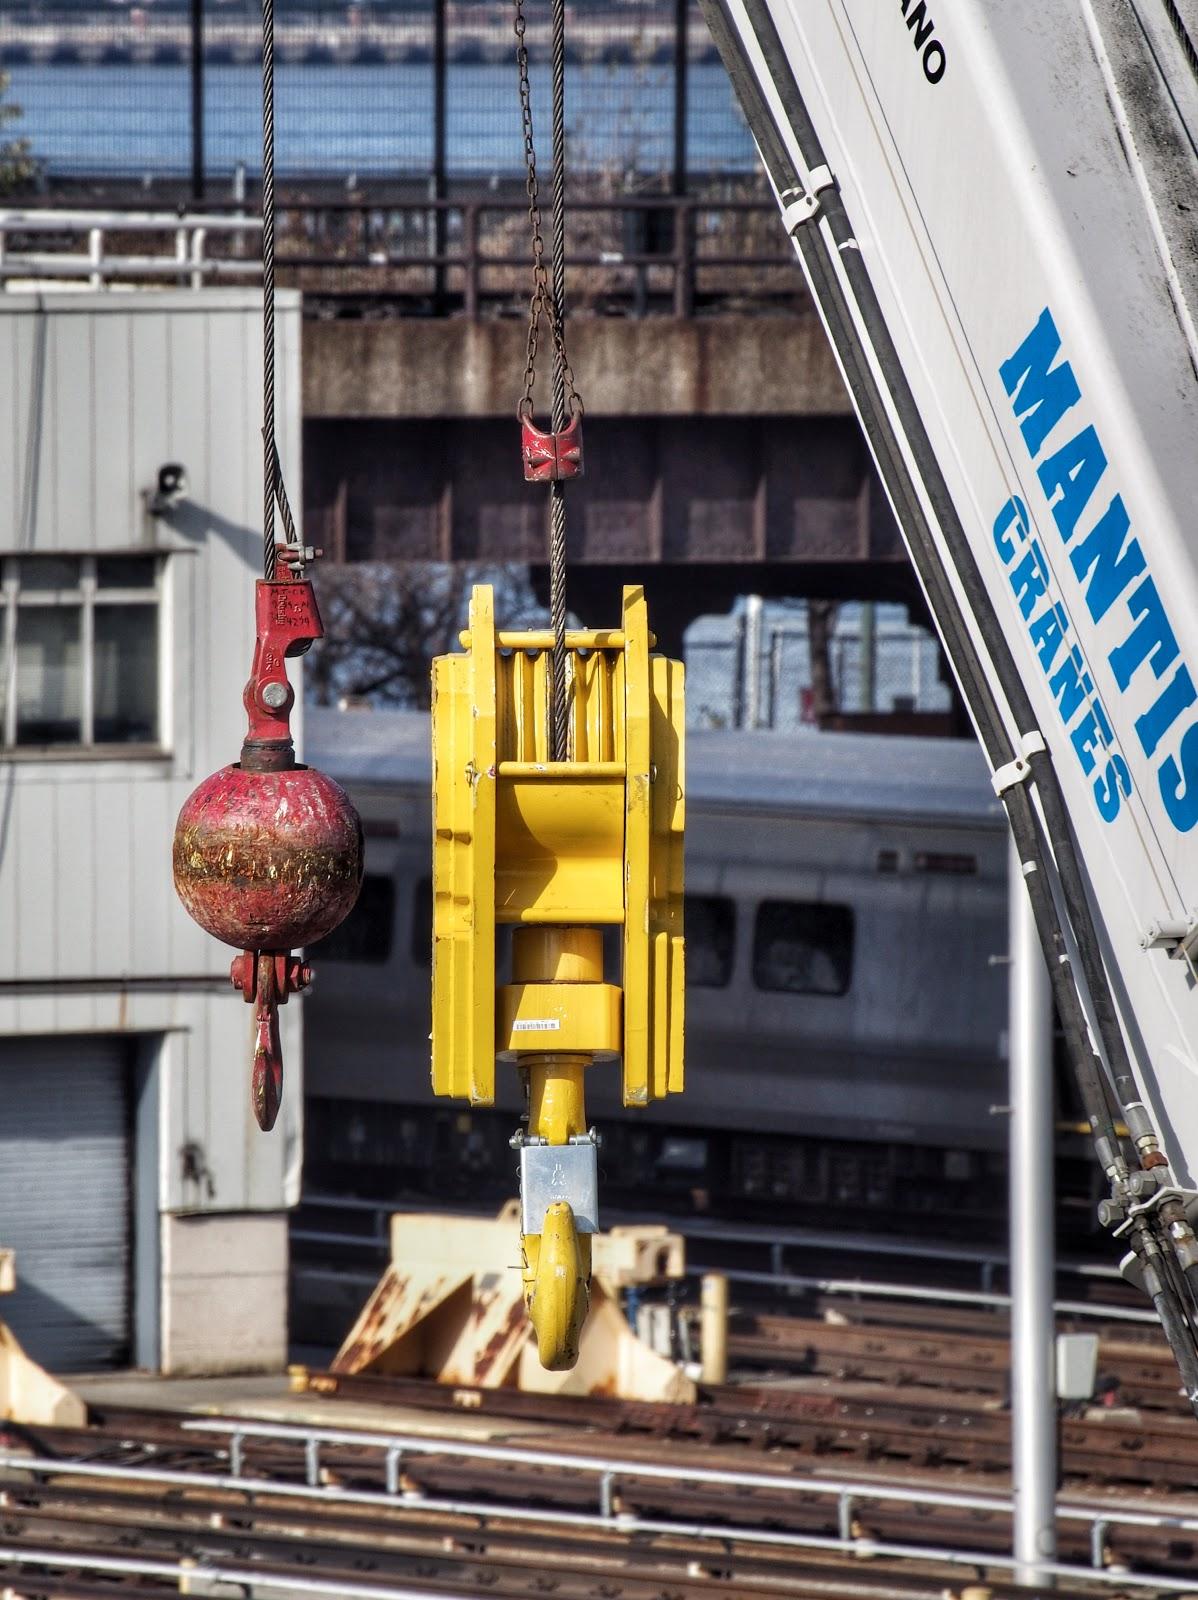 Hanging Out #crane  #twohooks #hudsonyard #mantiscrane #nyc #construction #LIRR #trains 2014